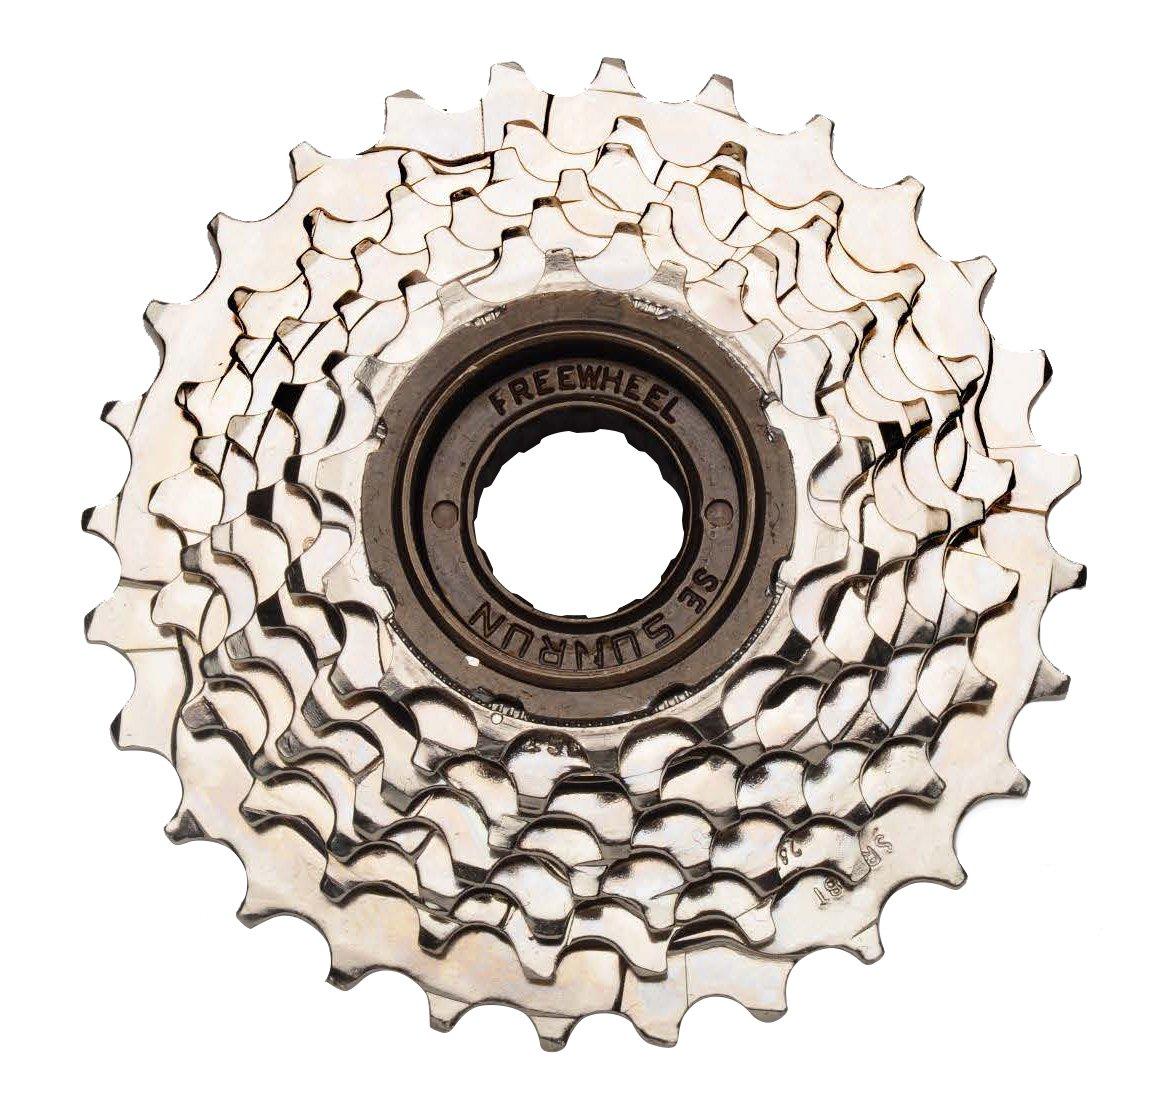 SUN RUN SunRun Seven Speed Freewheel